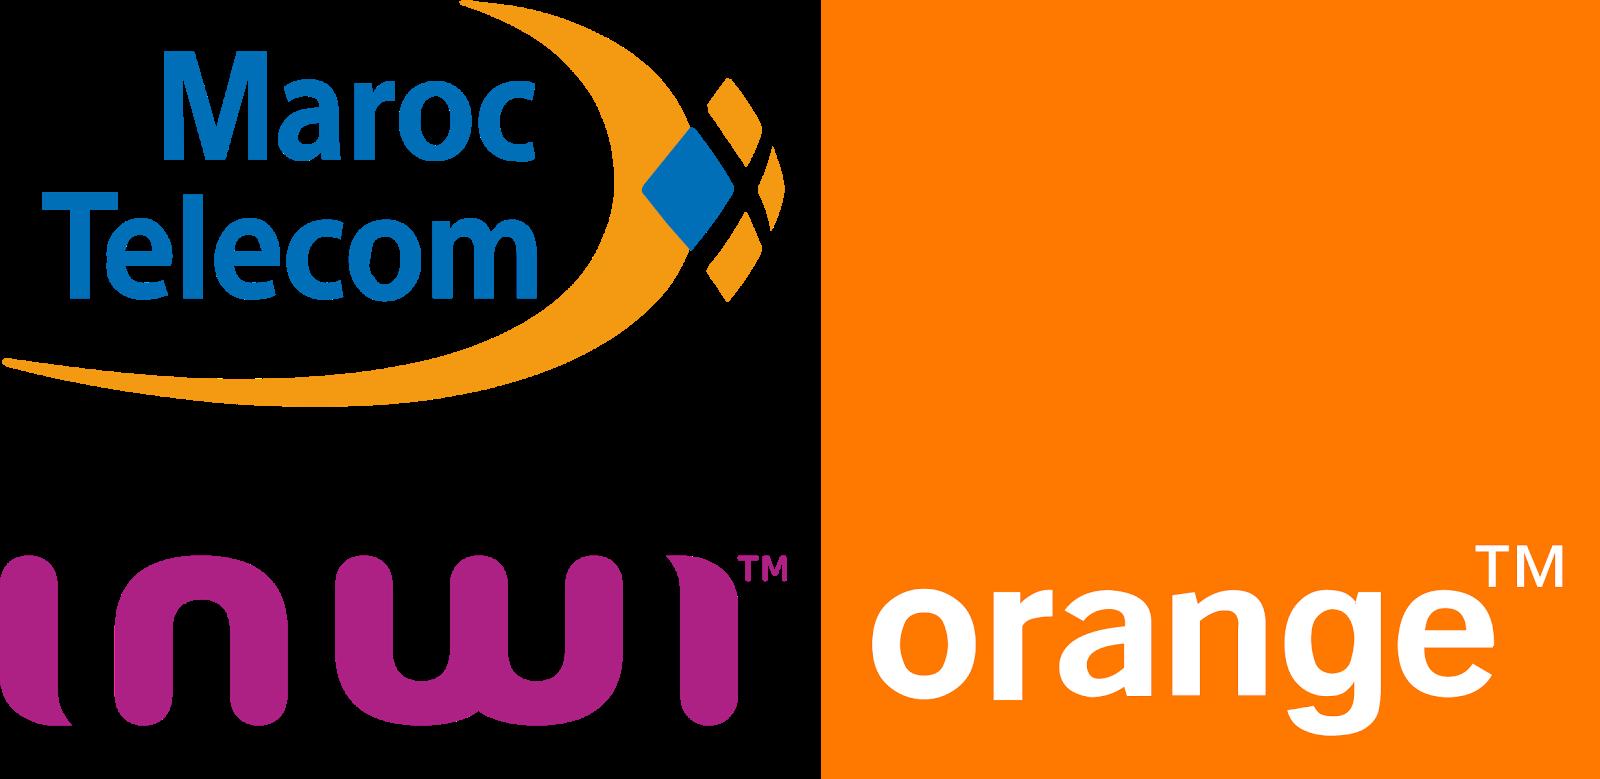 download logos maroc telecom inwi orange svg eps psd ai.